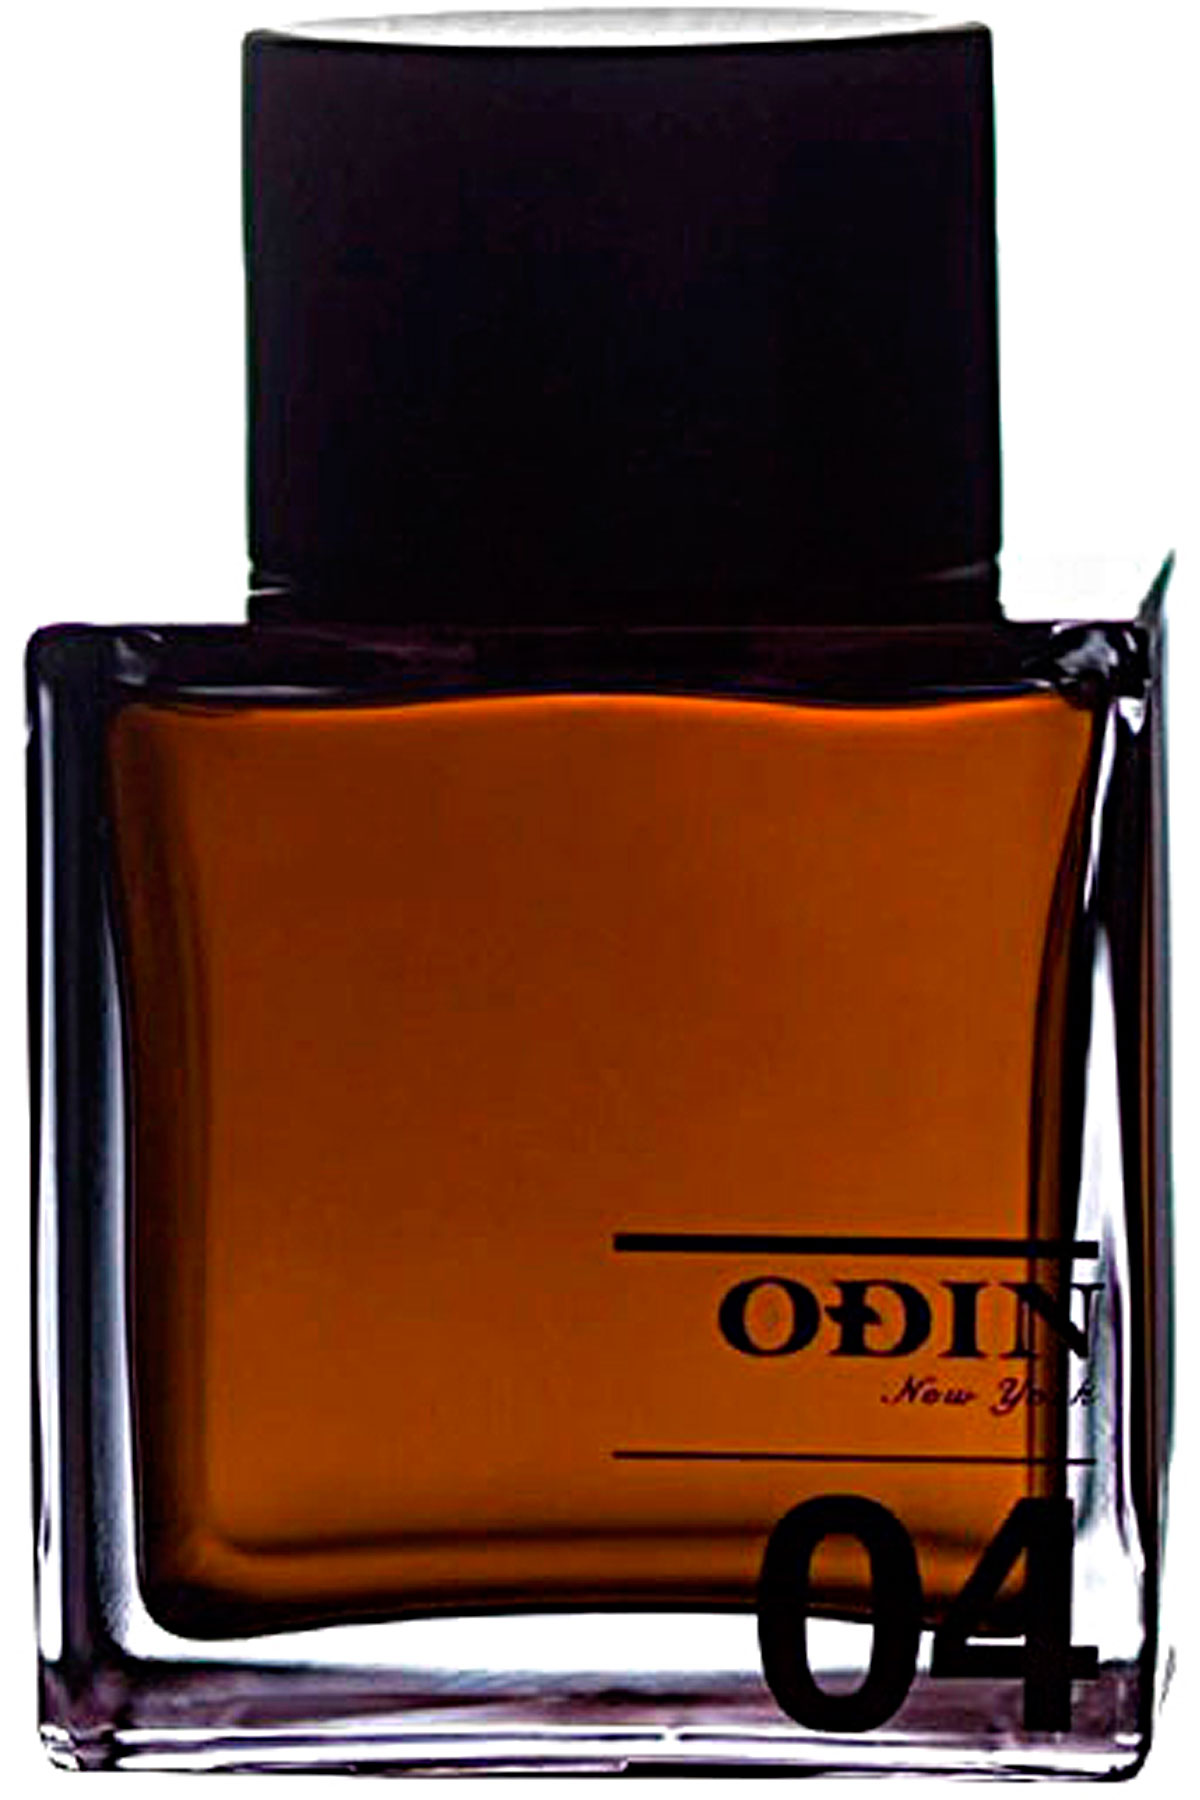 Odin New York Fragrances for Women On Sale, 04 Petrana - Eau De Parfum - 100 Ml, 2019, 100 ml